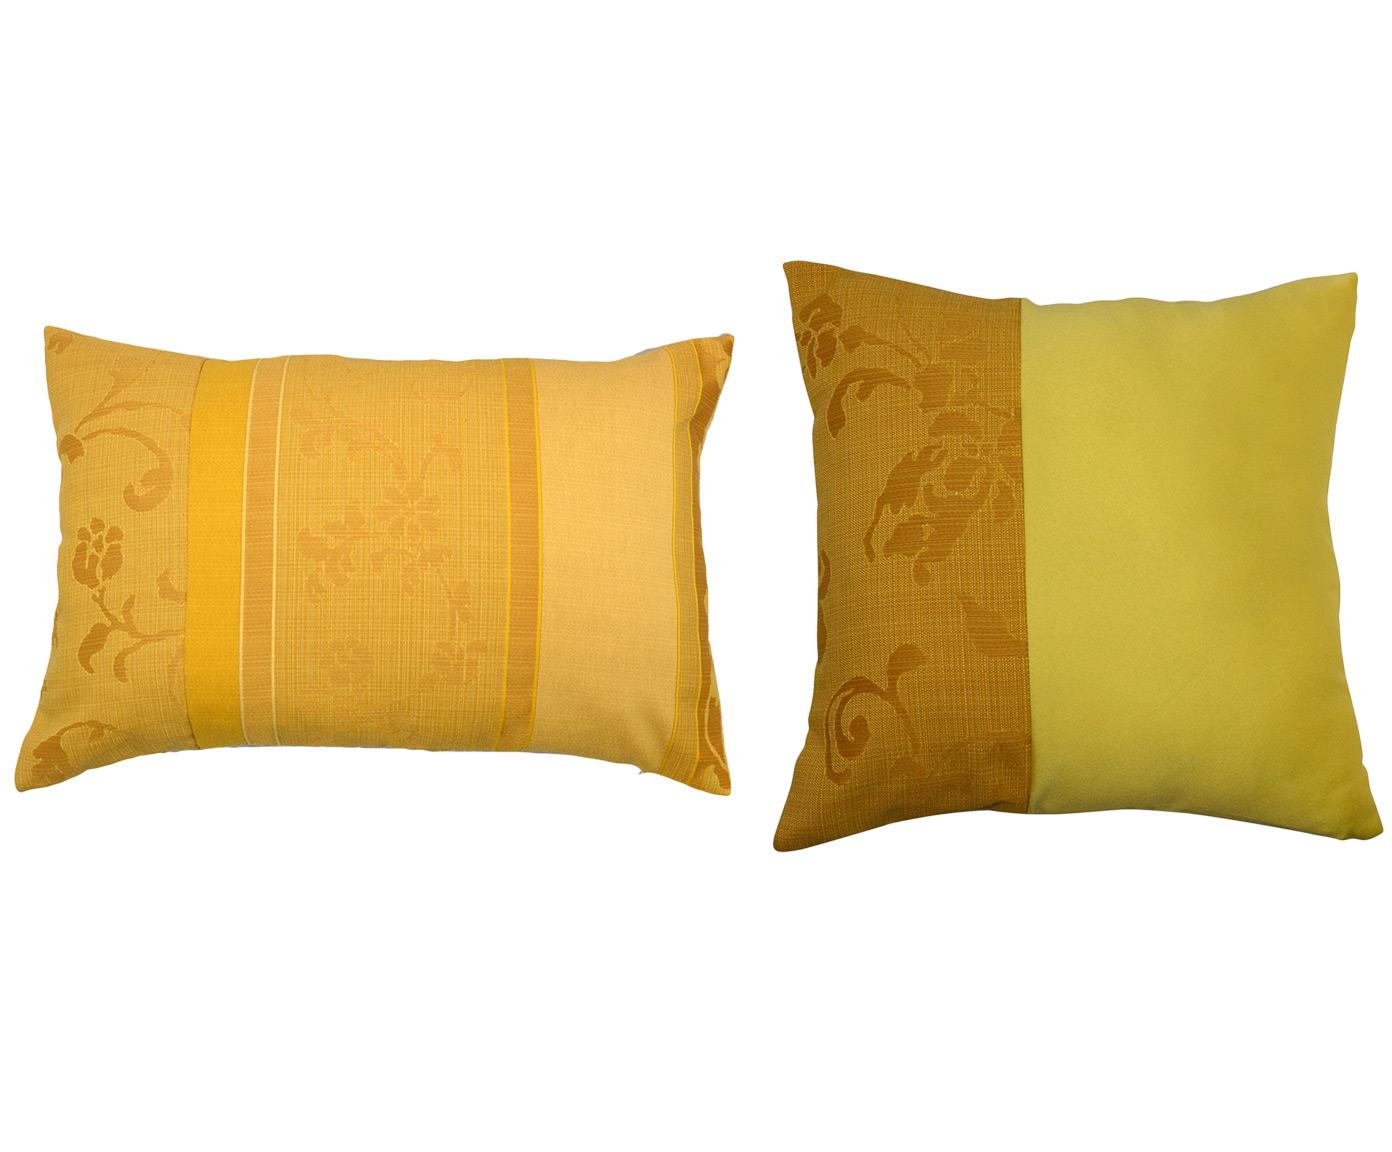 Комплект подушек Tender Yellow (2шт)Квадратные подушки<br>Комплект декоративных  подушек. Чехол съемный.<br><br>Material: Вискоза<br>Length см: 40<br>Width см: 60.4<br>Depth см: 15